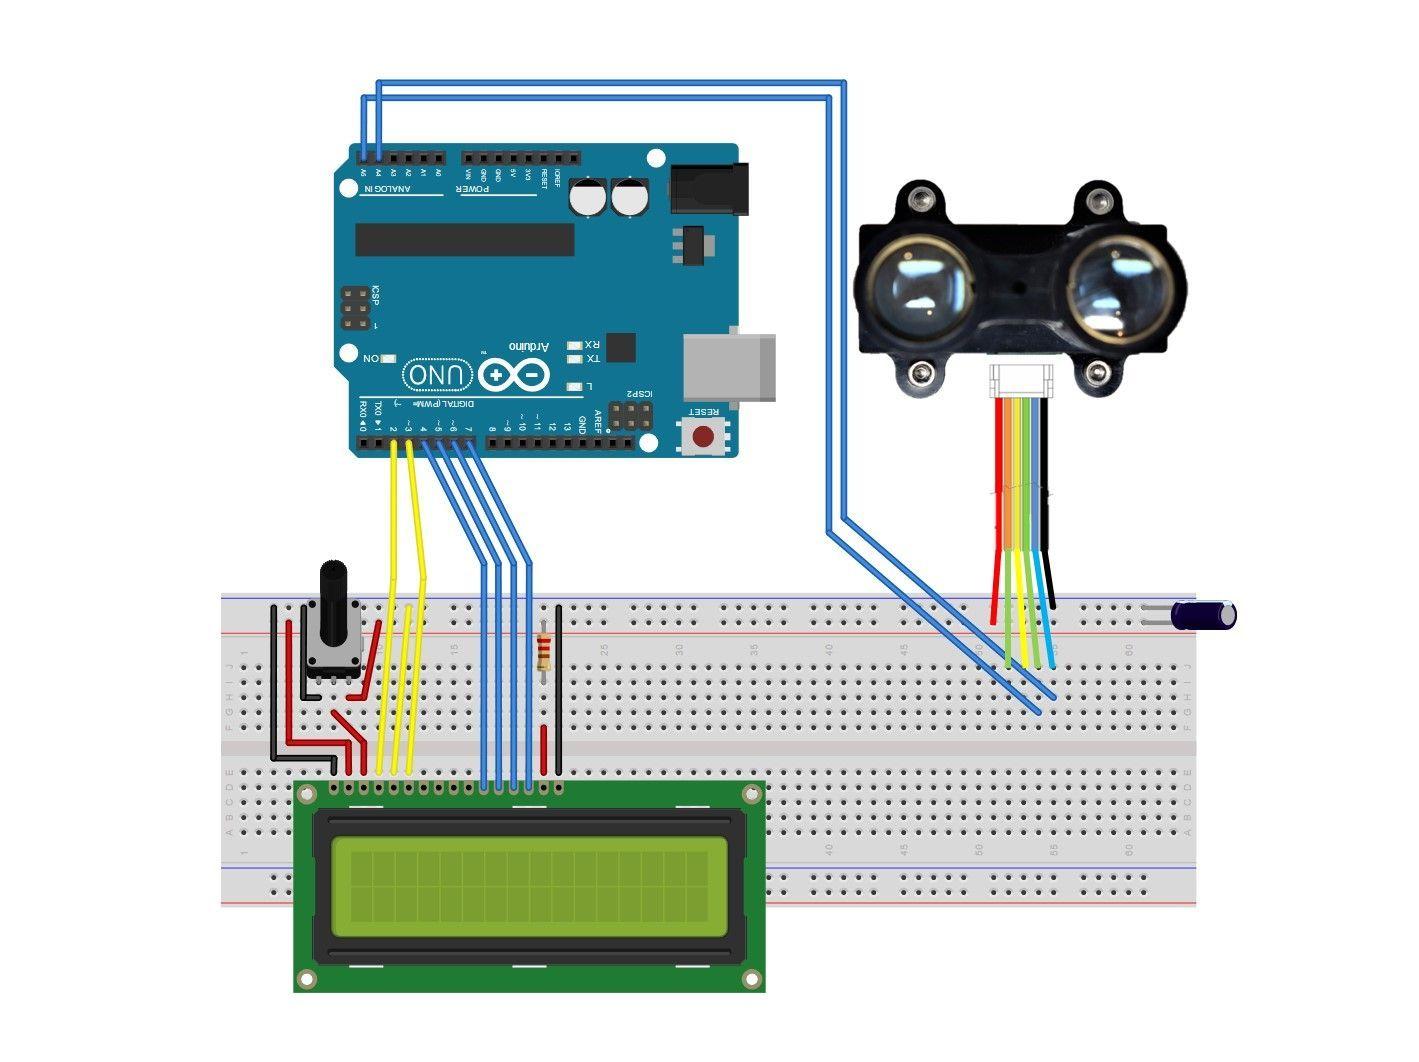 LiDARLite Module Arduino, Solderless breadboard, Laser